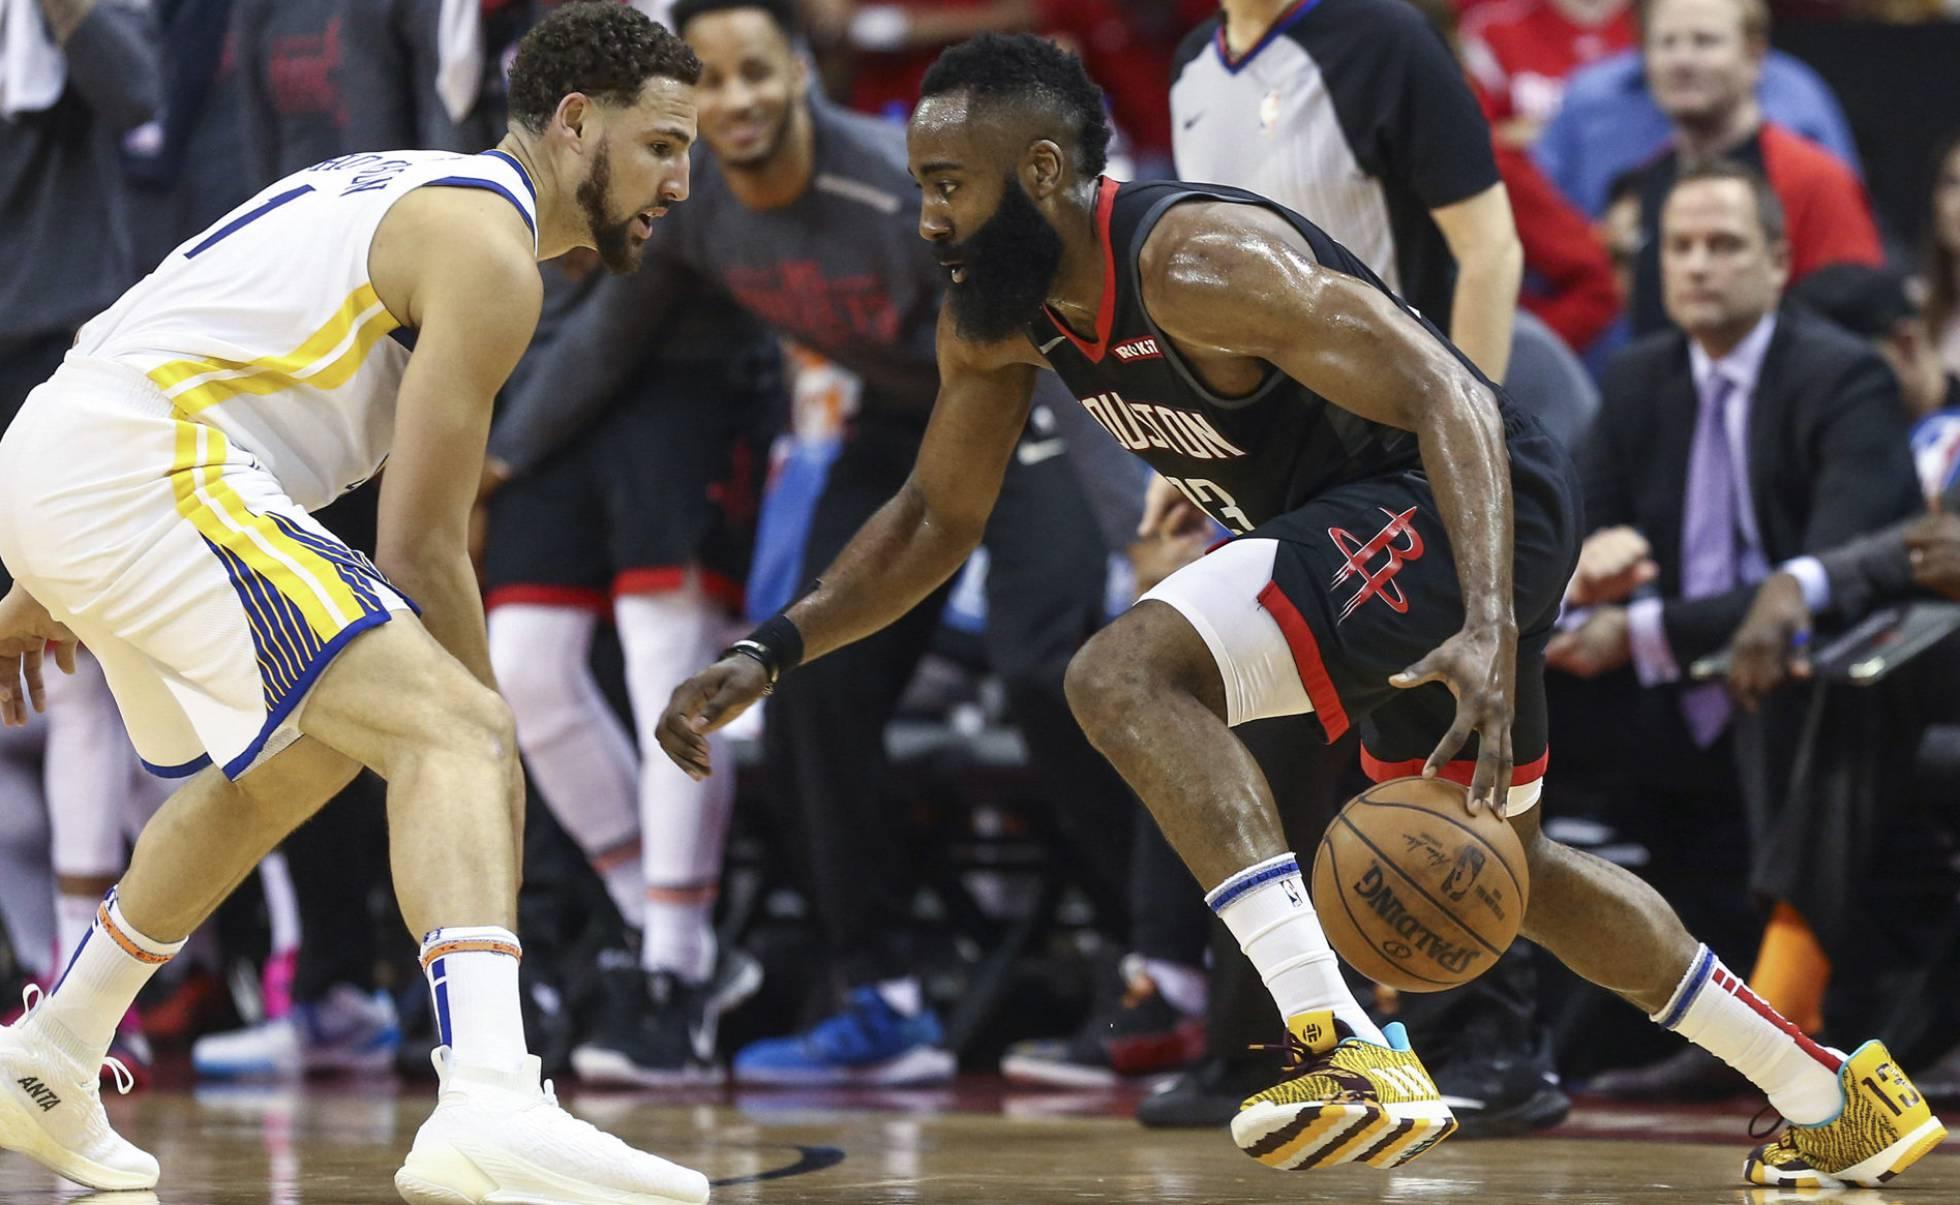 Golden State se impusieron por 104-106 a los Rockets de Houston